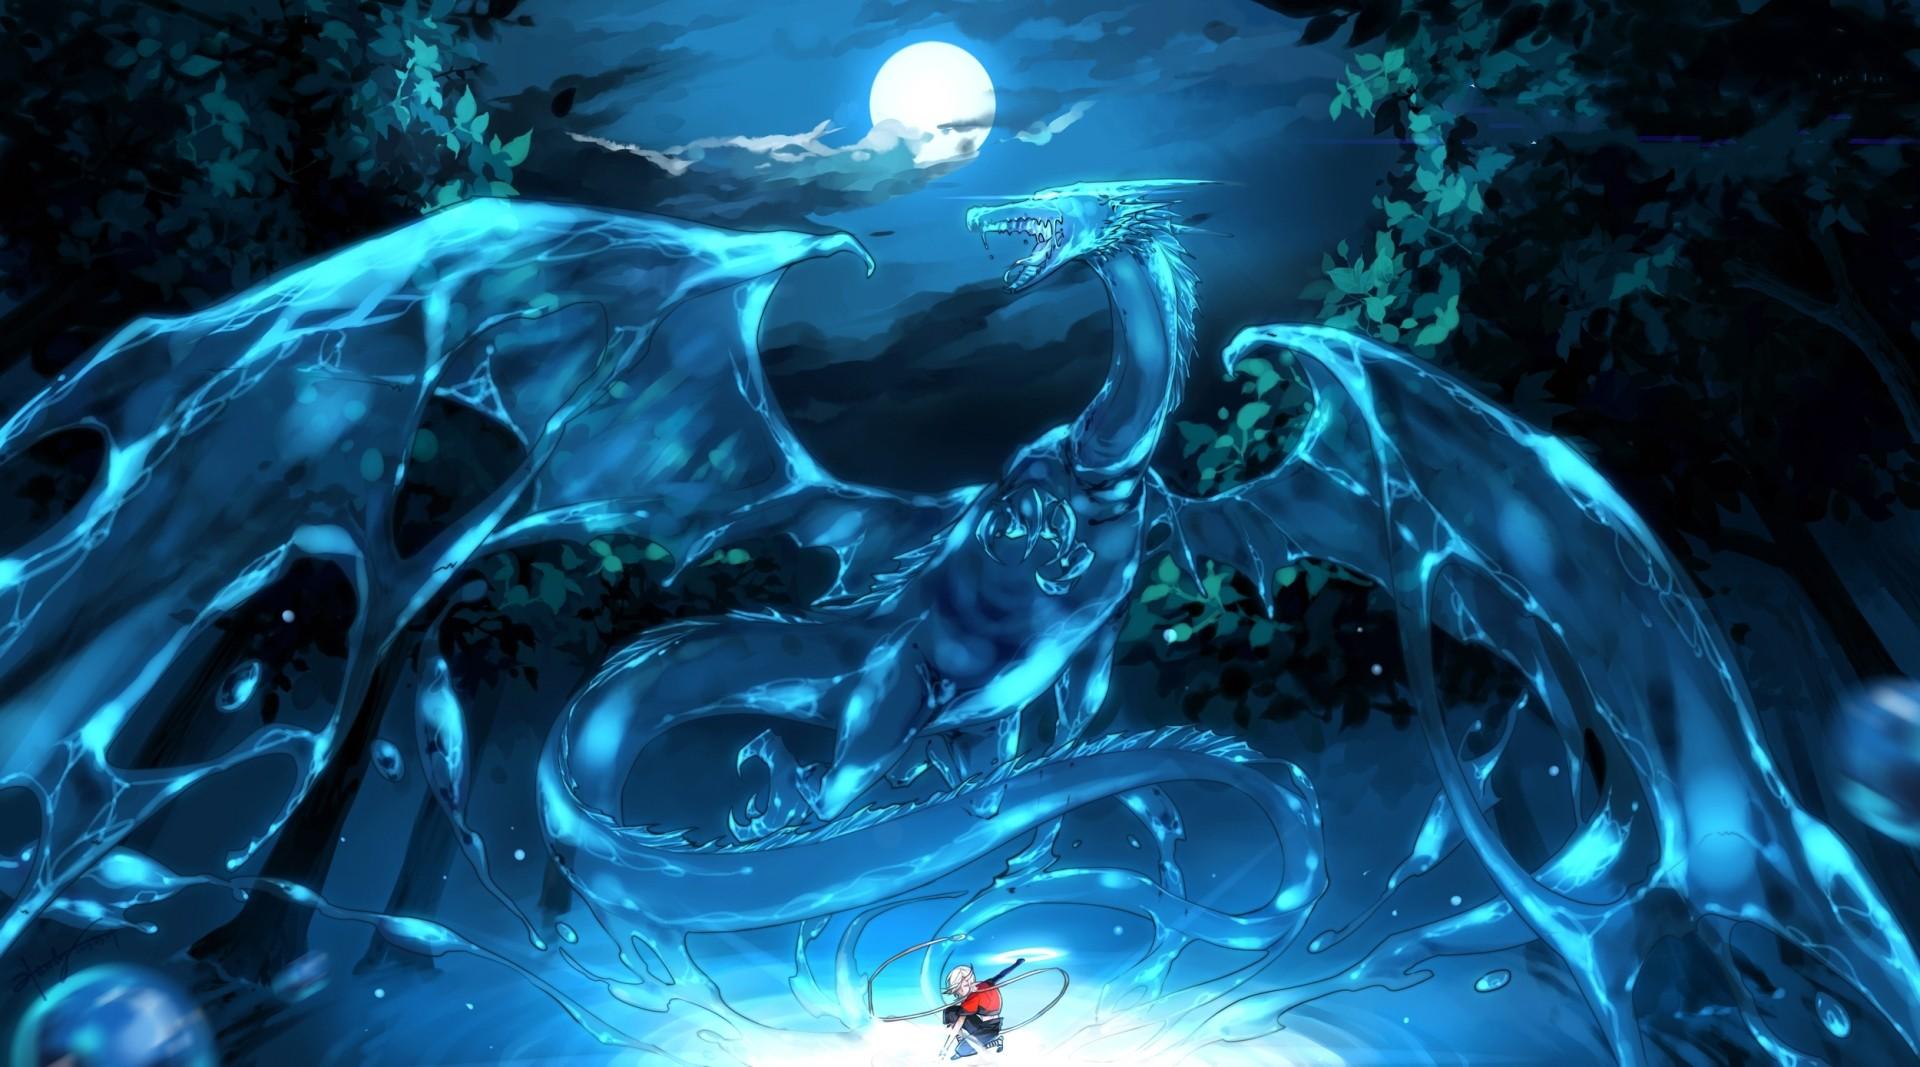 Wallpaper : anime, ice, underwater, dragon, screenshot